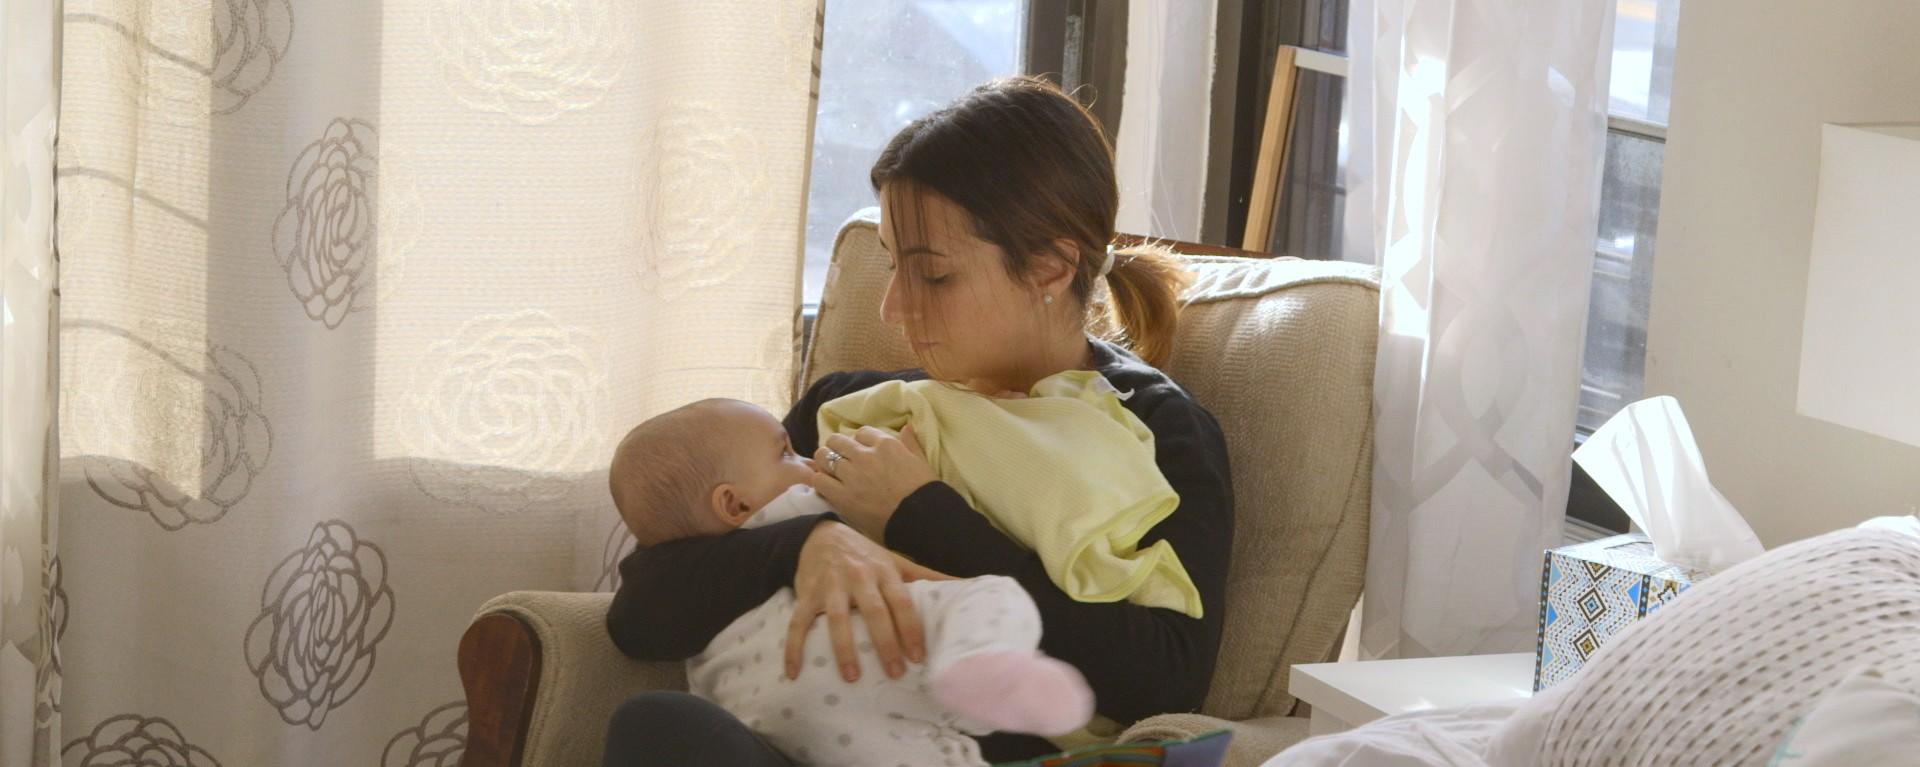 Trotz mirena schwangerschaft Schwanger trotz